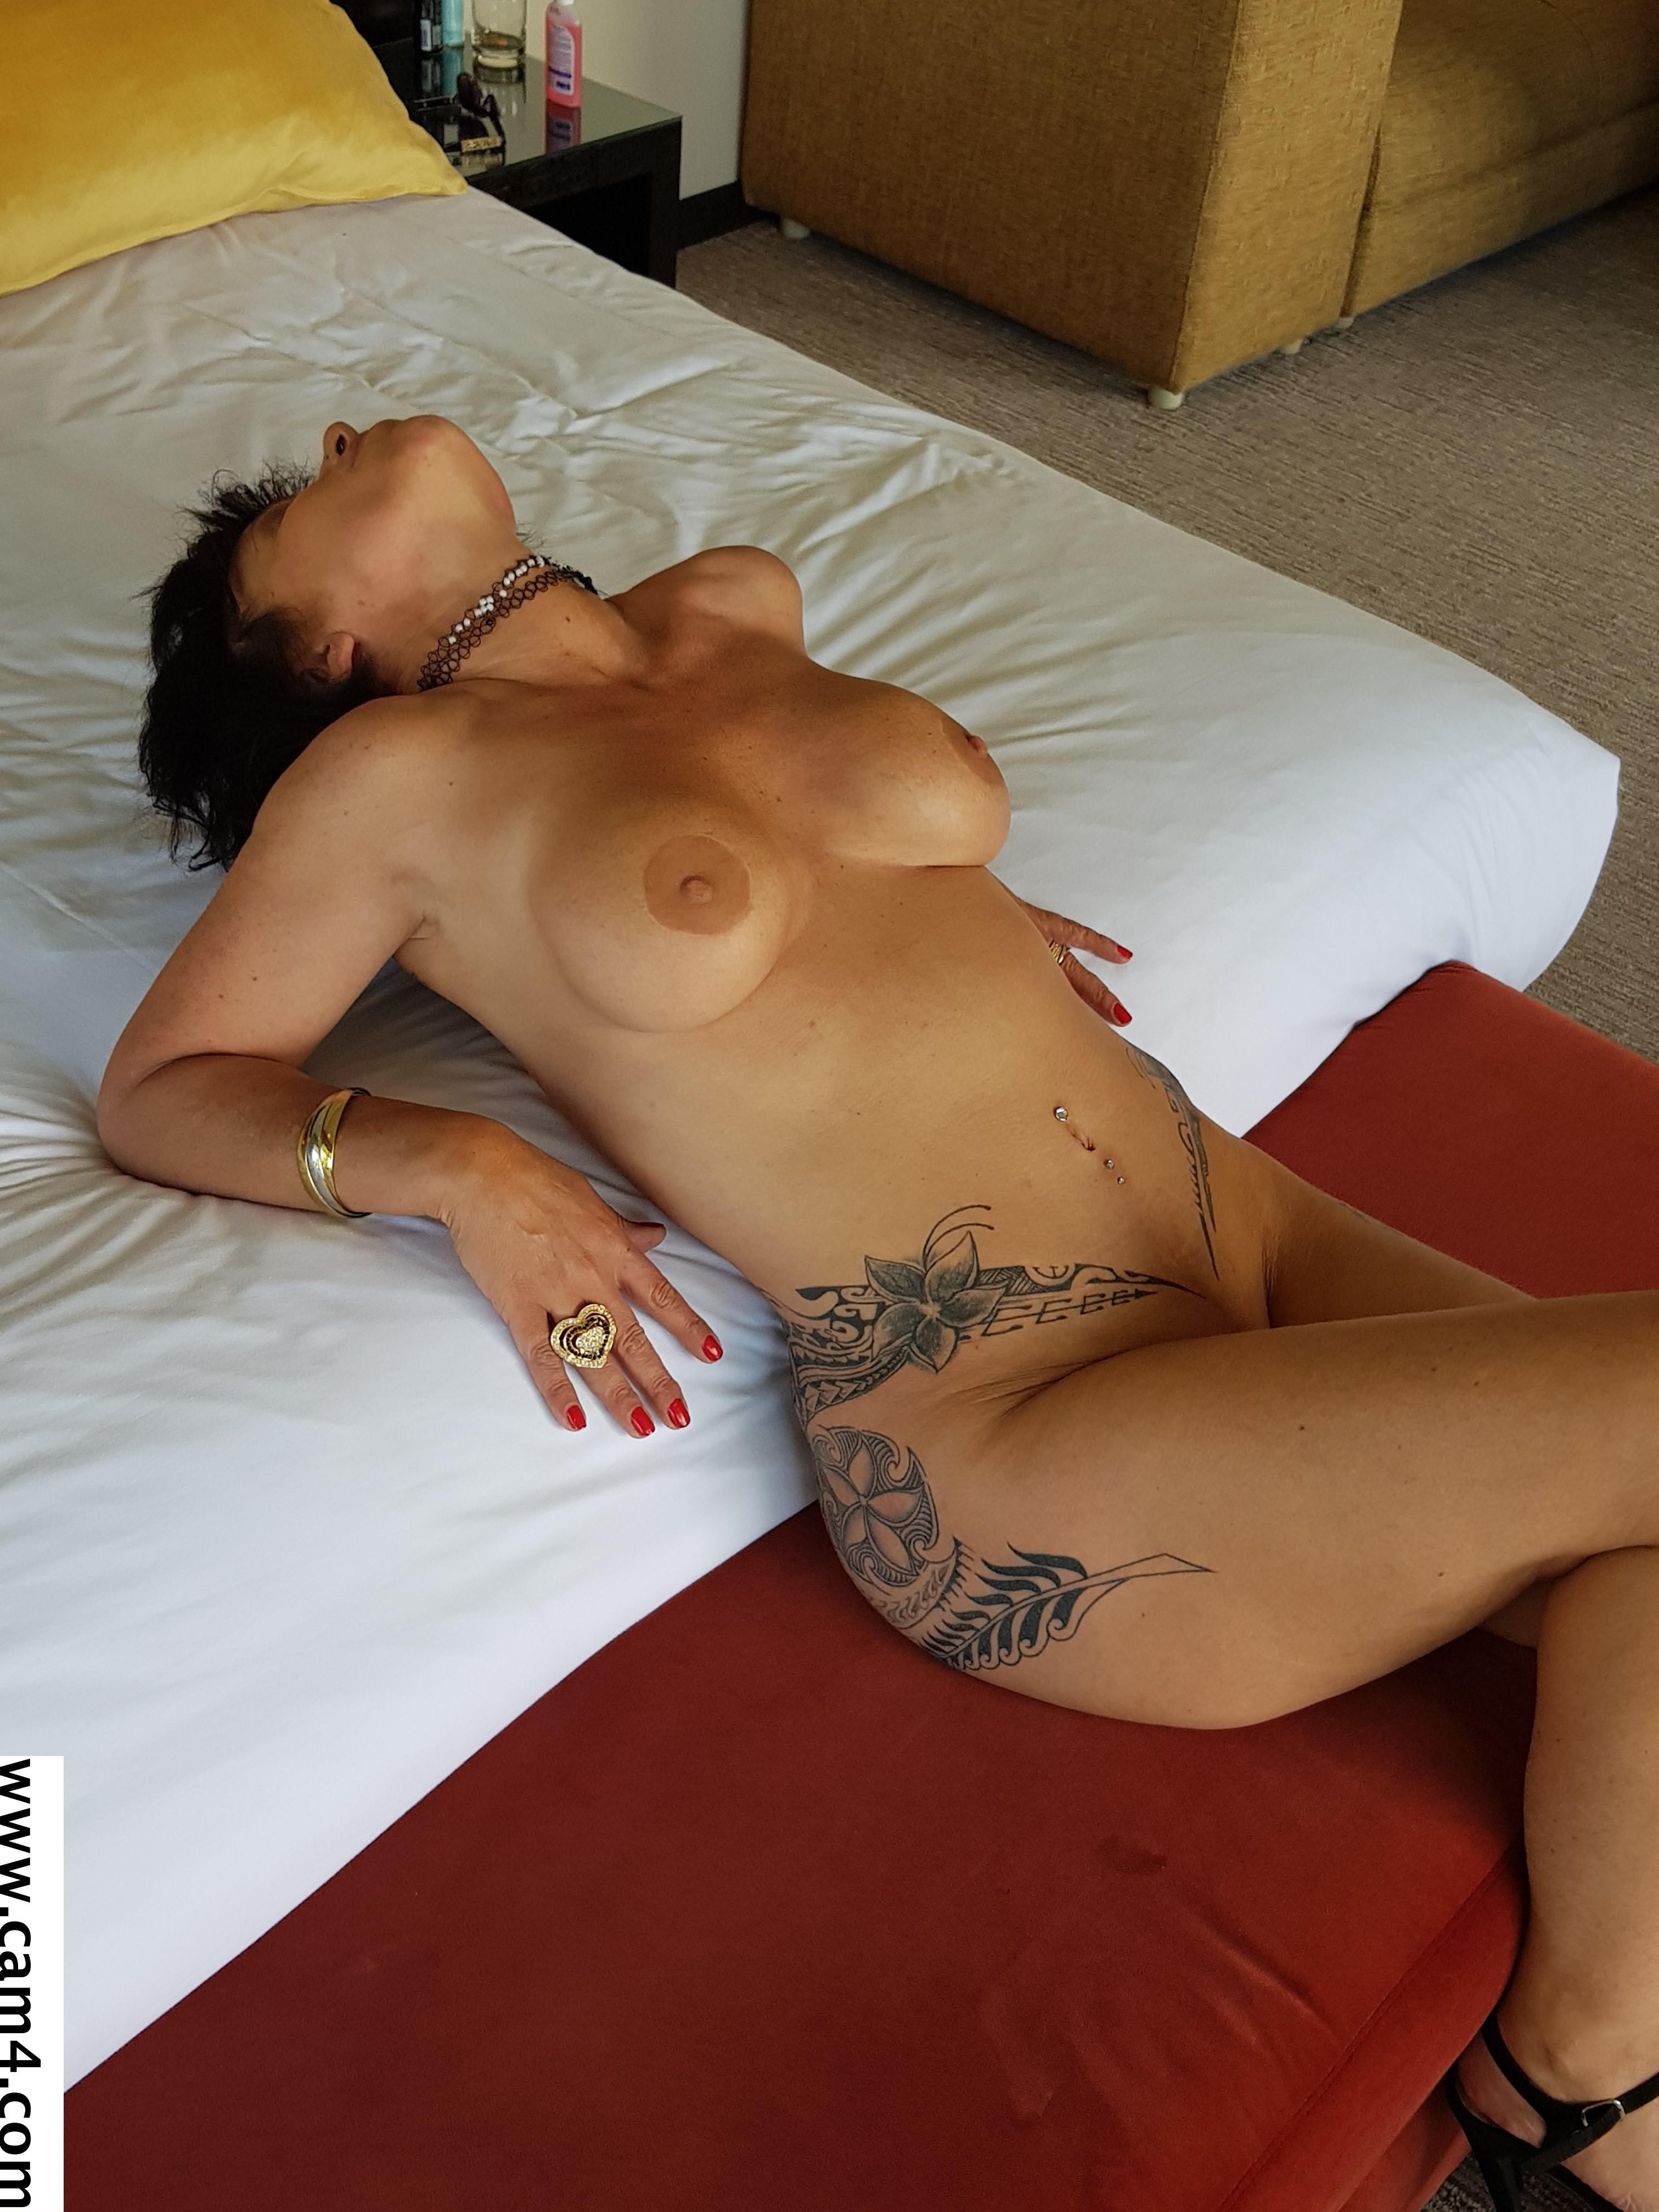 live sex cam vidéo sexe chaud